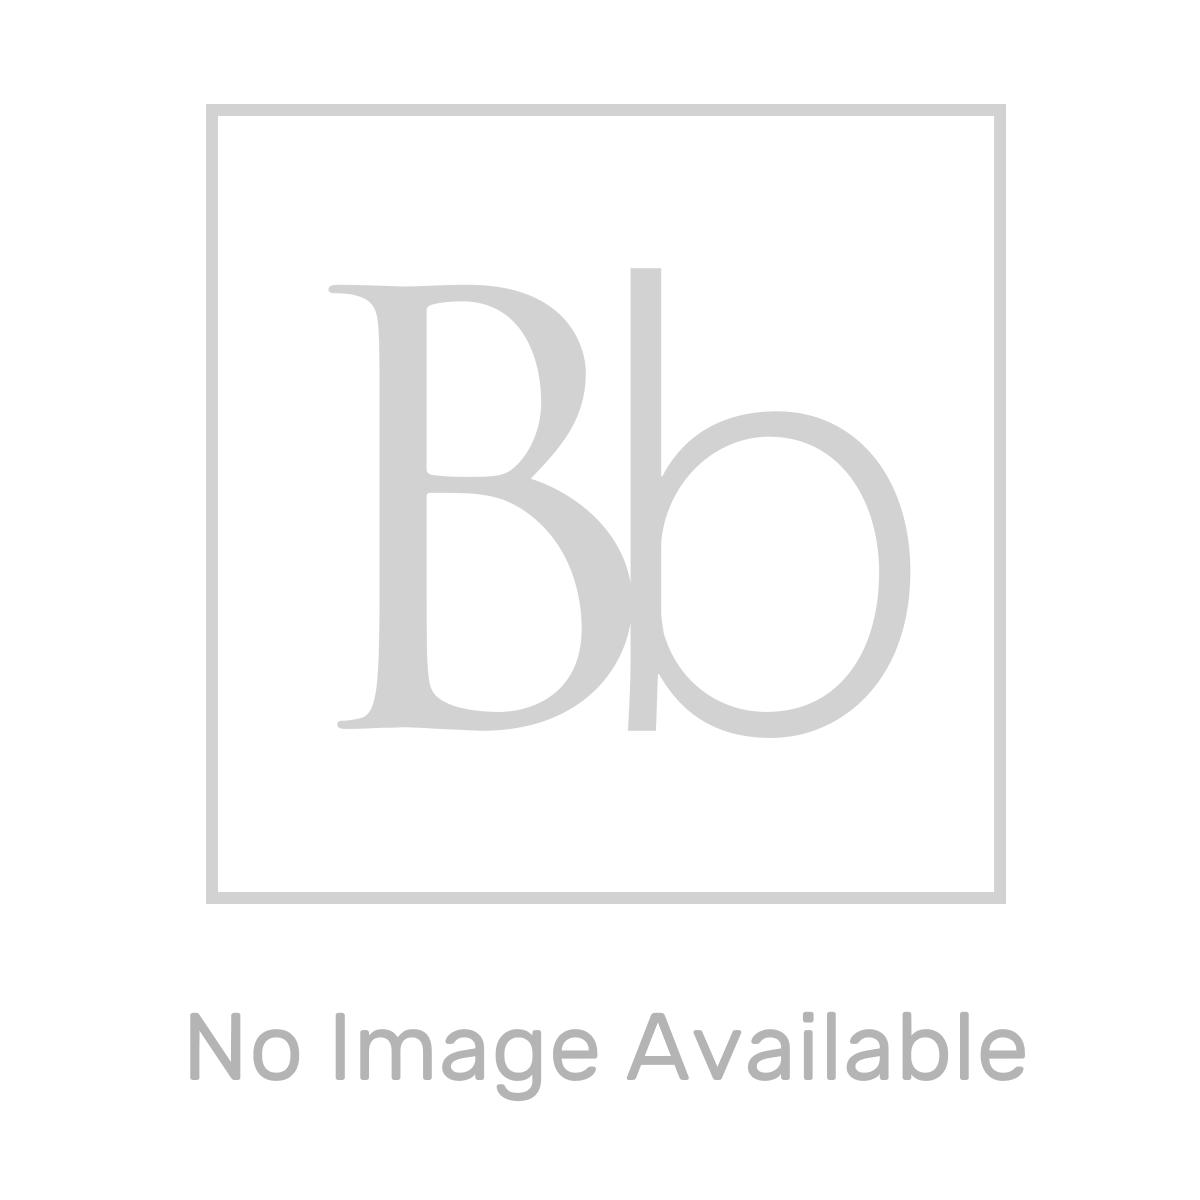 Aquadart Black Slate Shower Tray 1600 x 800 Dimension